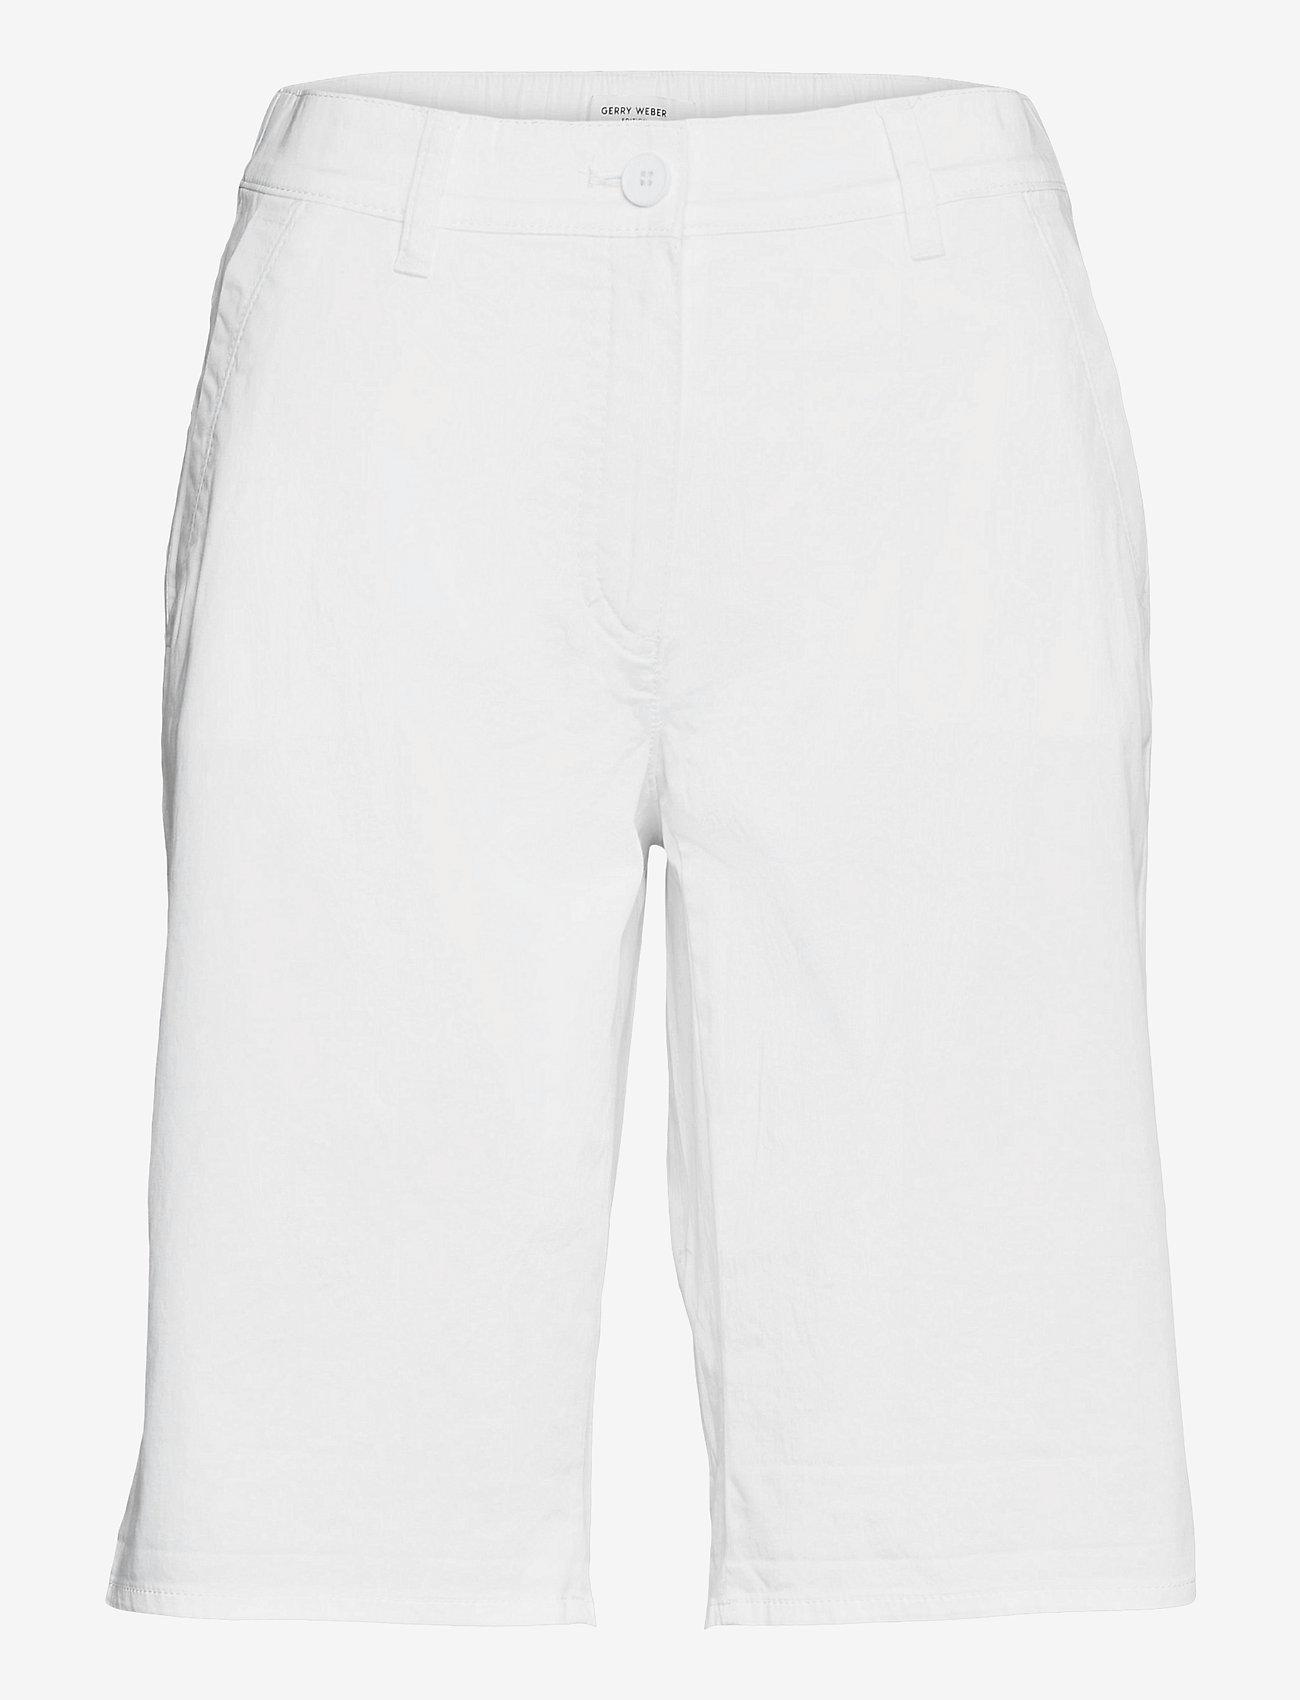 Gerry Weber Edition - CROP LEISURE TROUSER - bermudas - white/white - 0